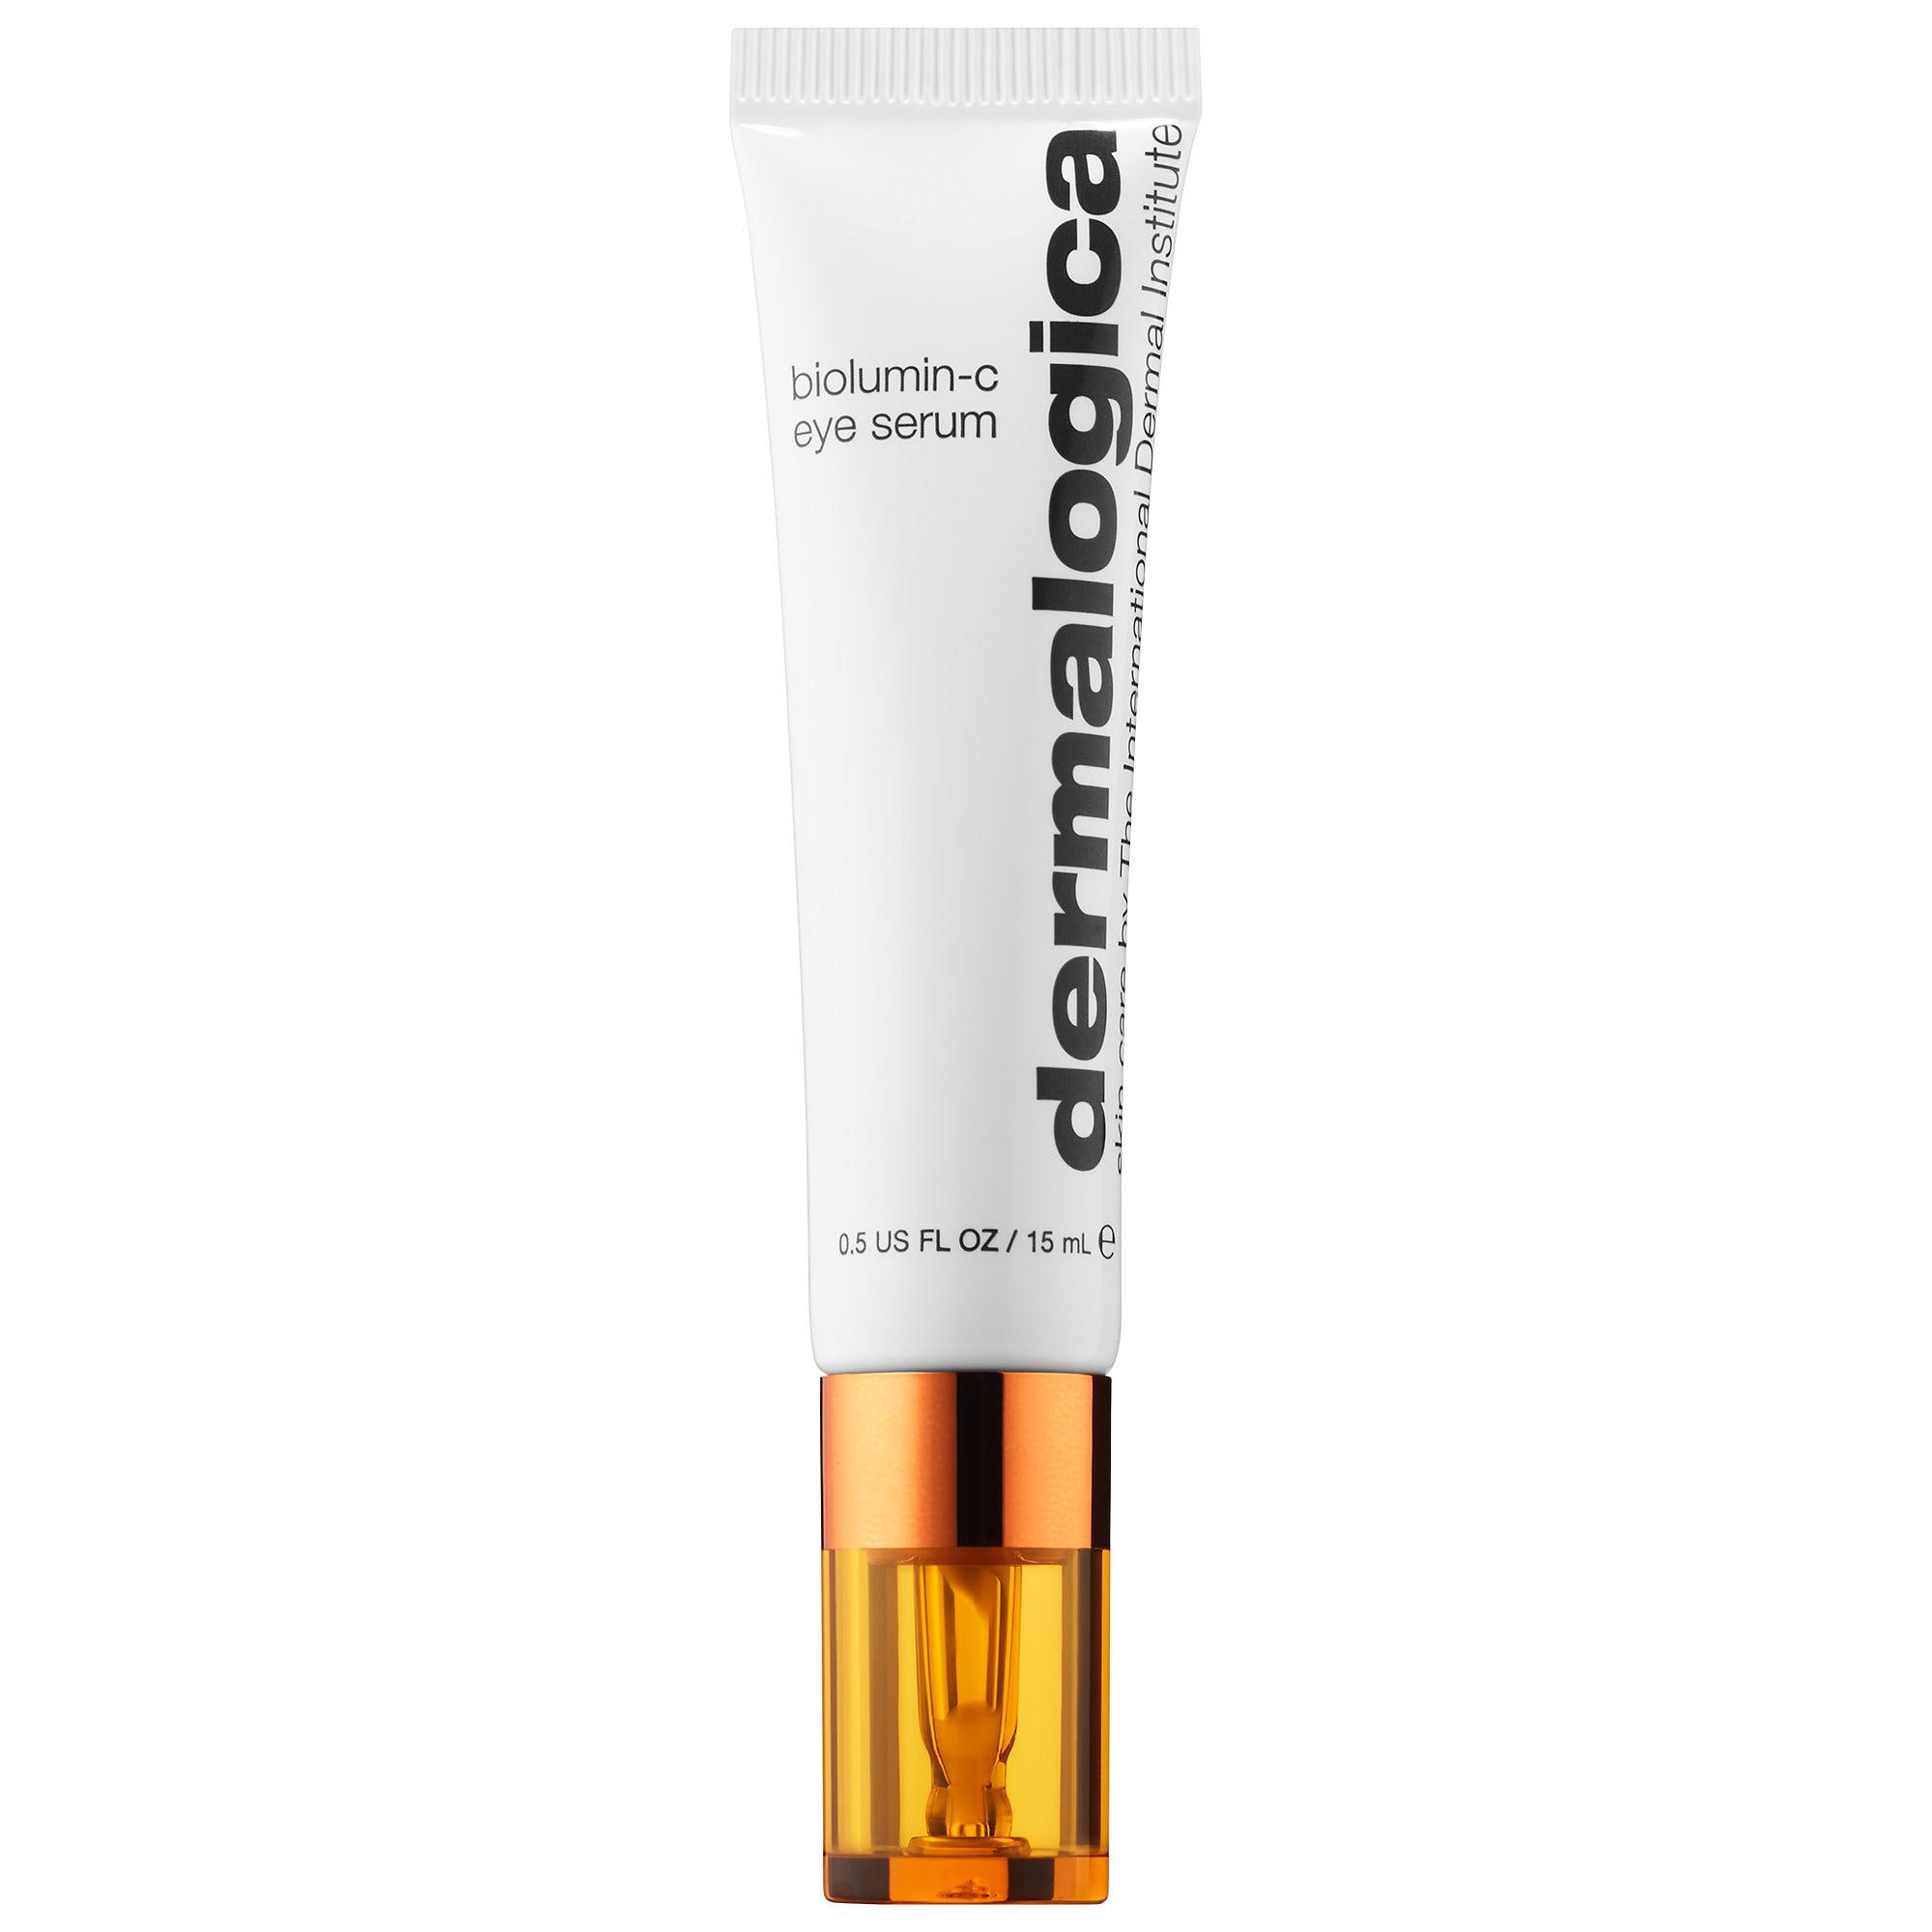 Dermalogica - Biolumin-C Vitamin C Eye Serum